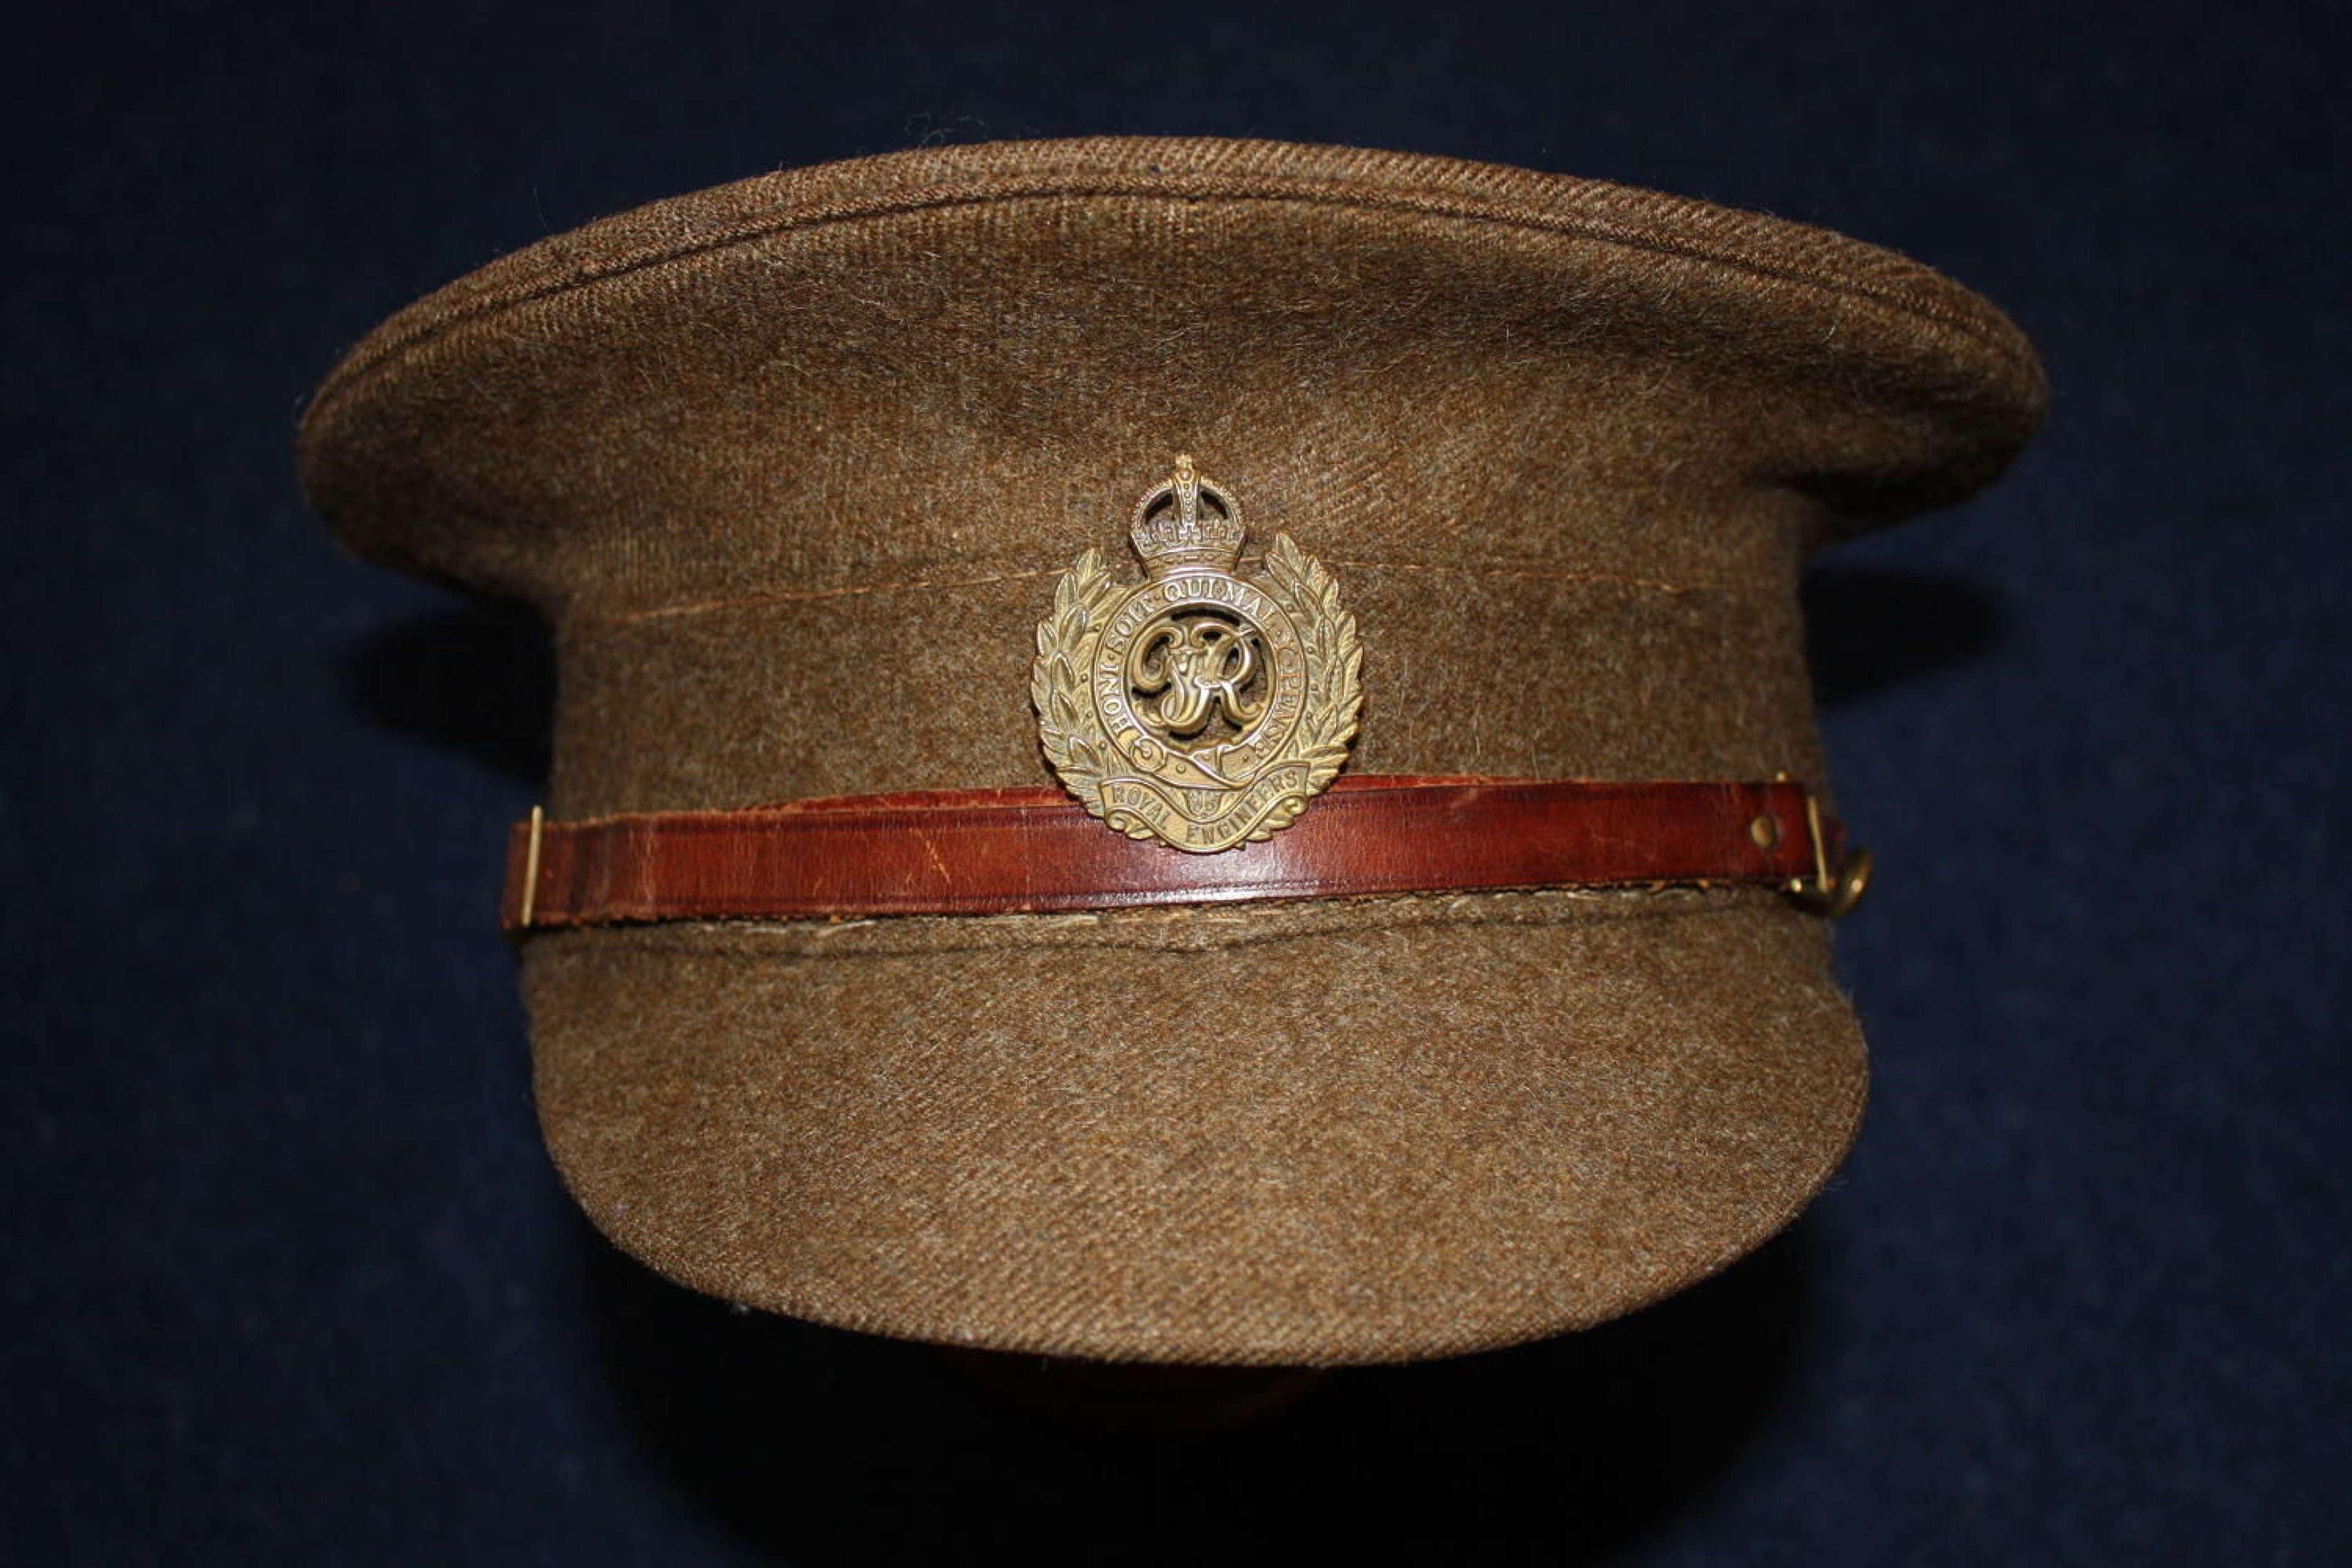 1905 Pattern WW2 British Other Ranks Khaki Service Dress Cap